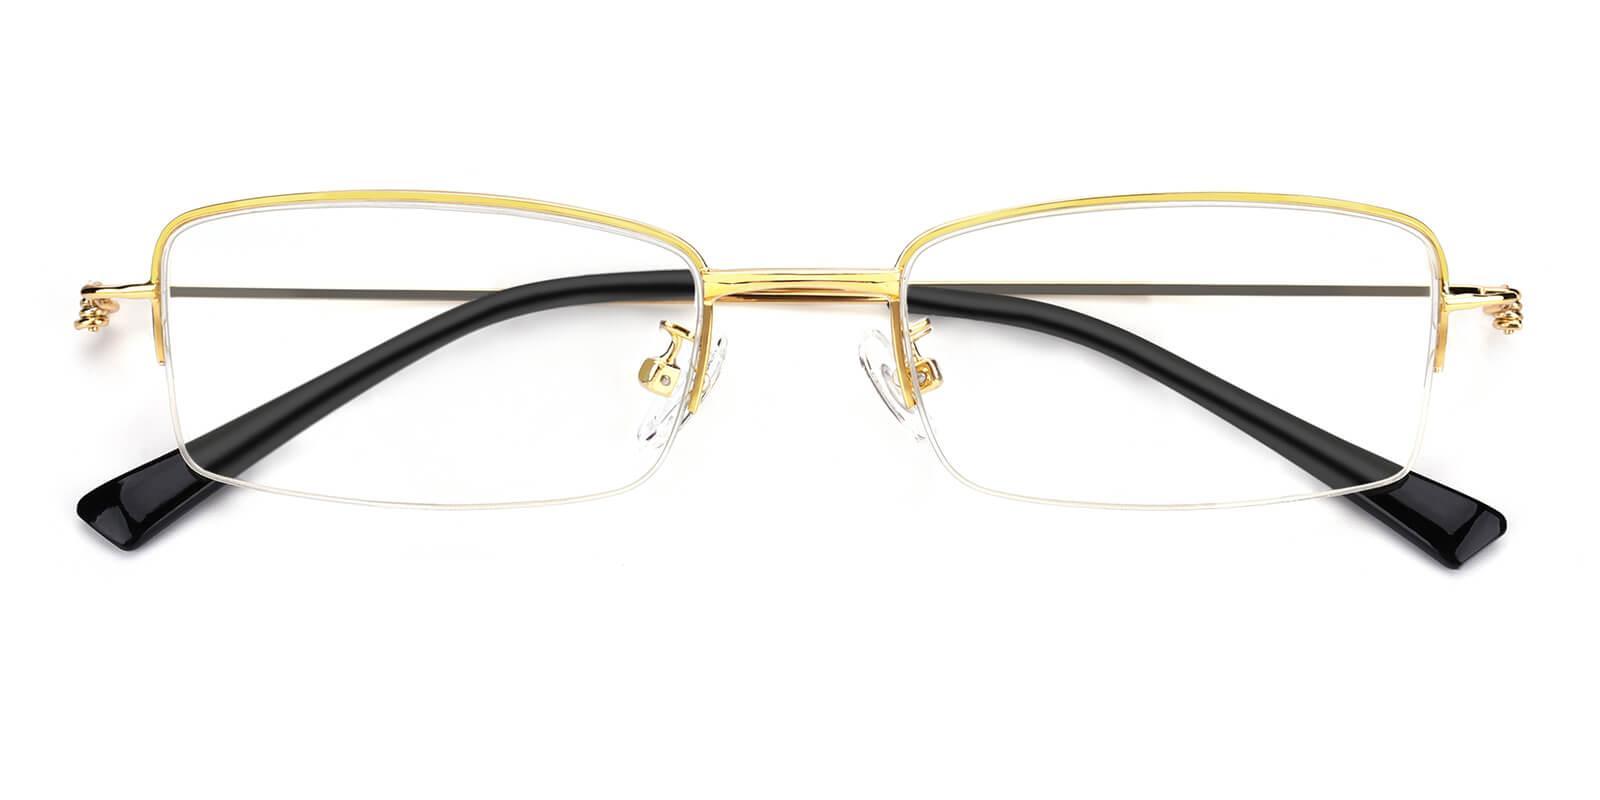 Rector-Gold-Rectangle-Metal-Eyeglasses-detail